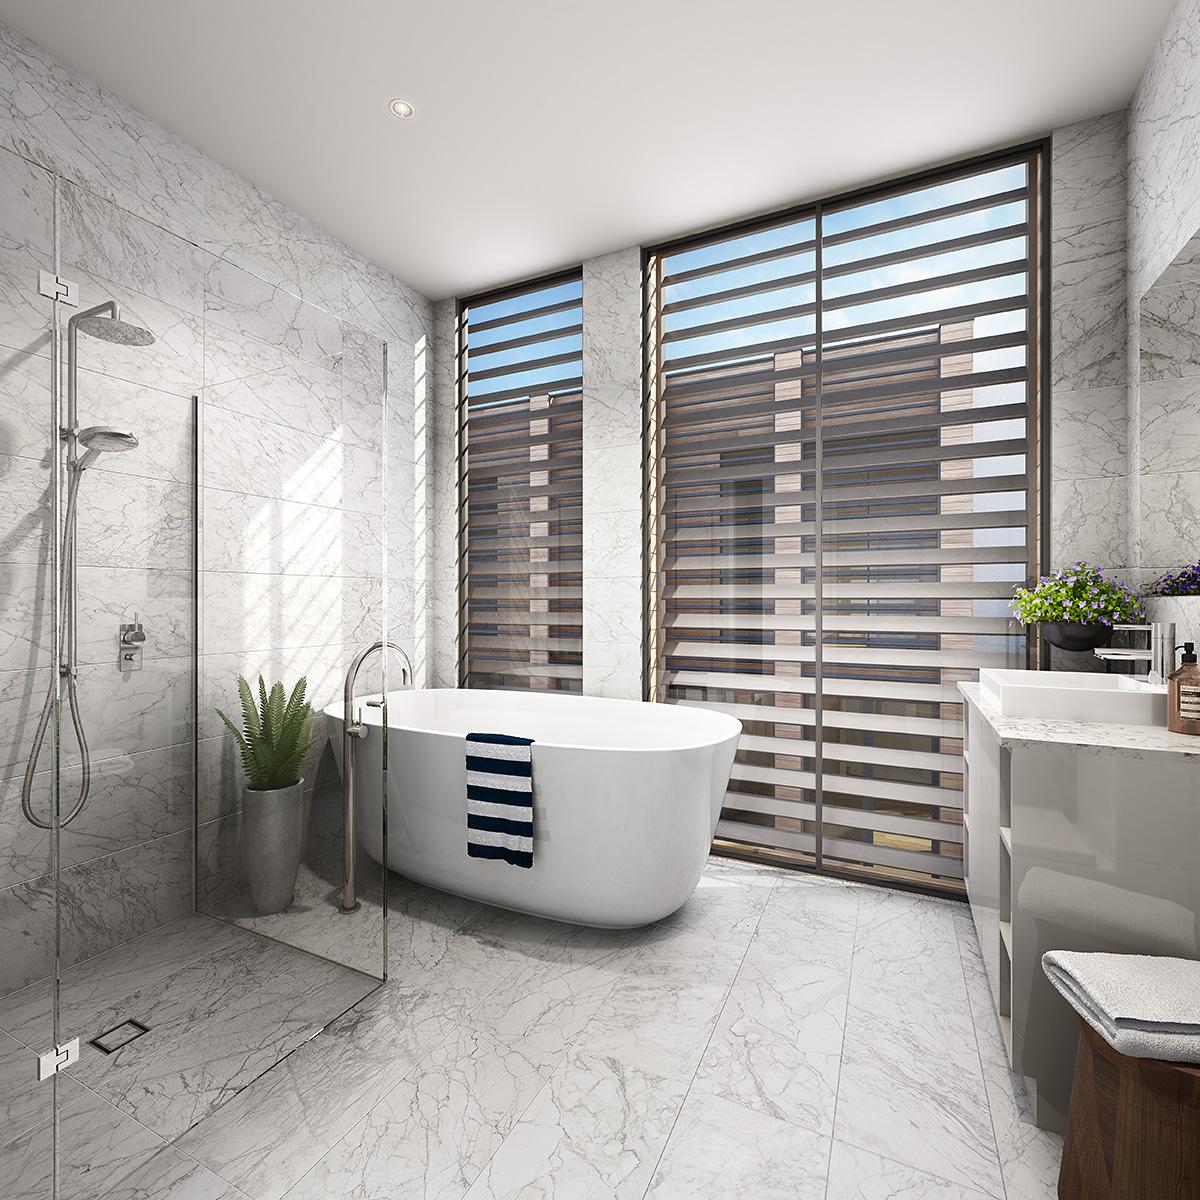 1688_INT_Bathroom_View02_C_(web).jpg